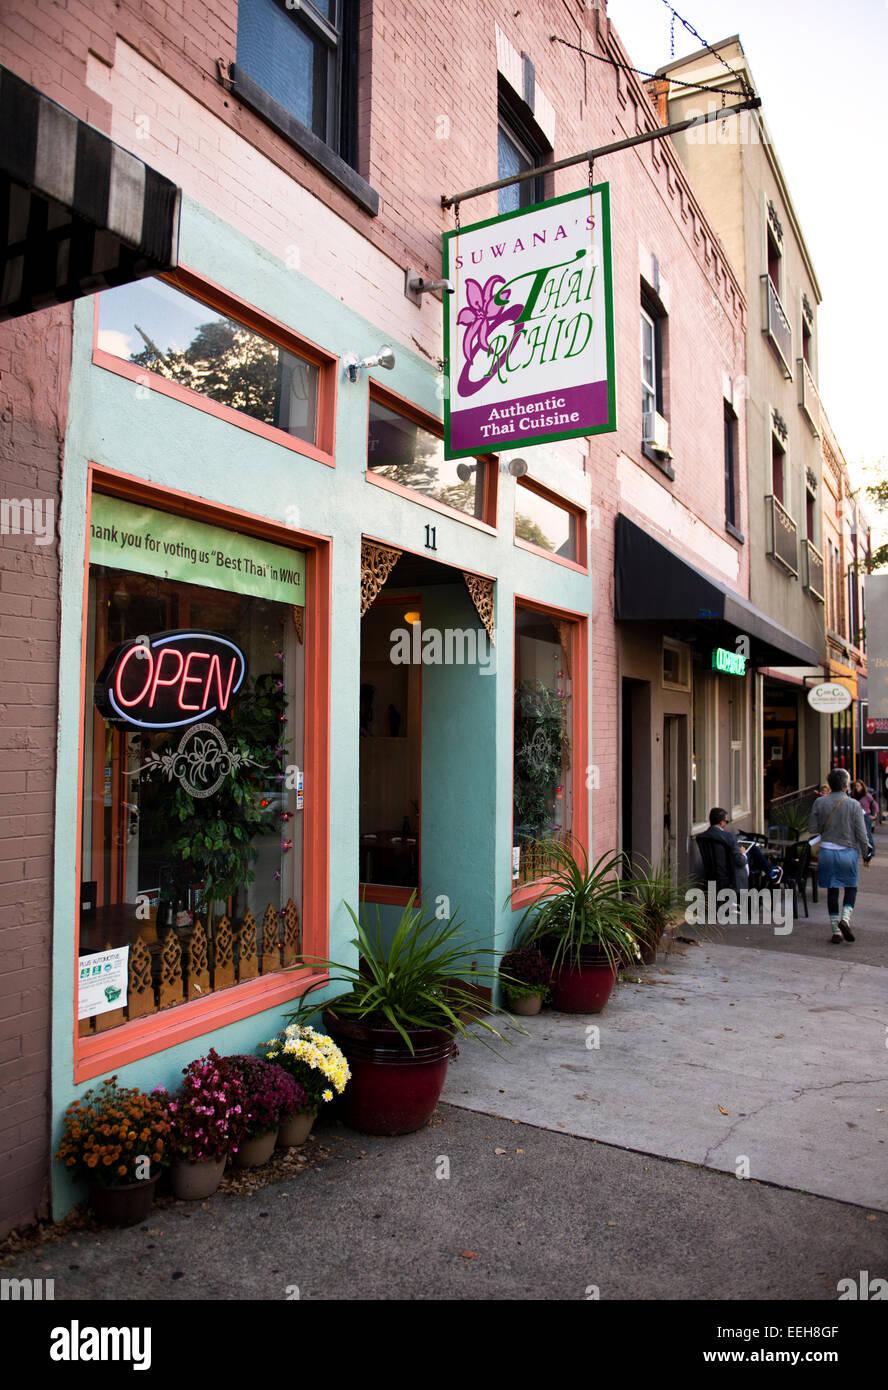 Suwana's Thai Orchid Restaurant in Asheville North Carolina - Stock Image